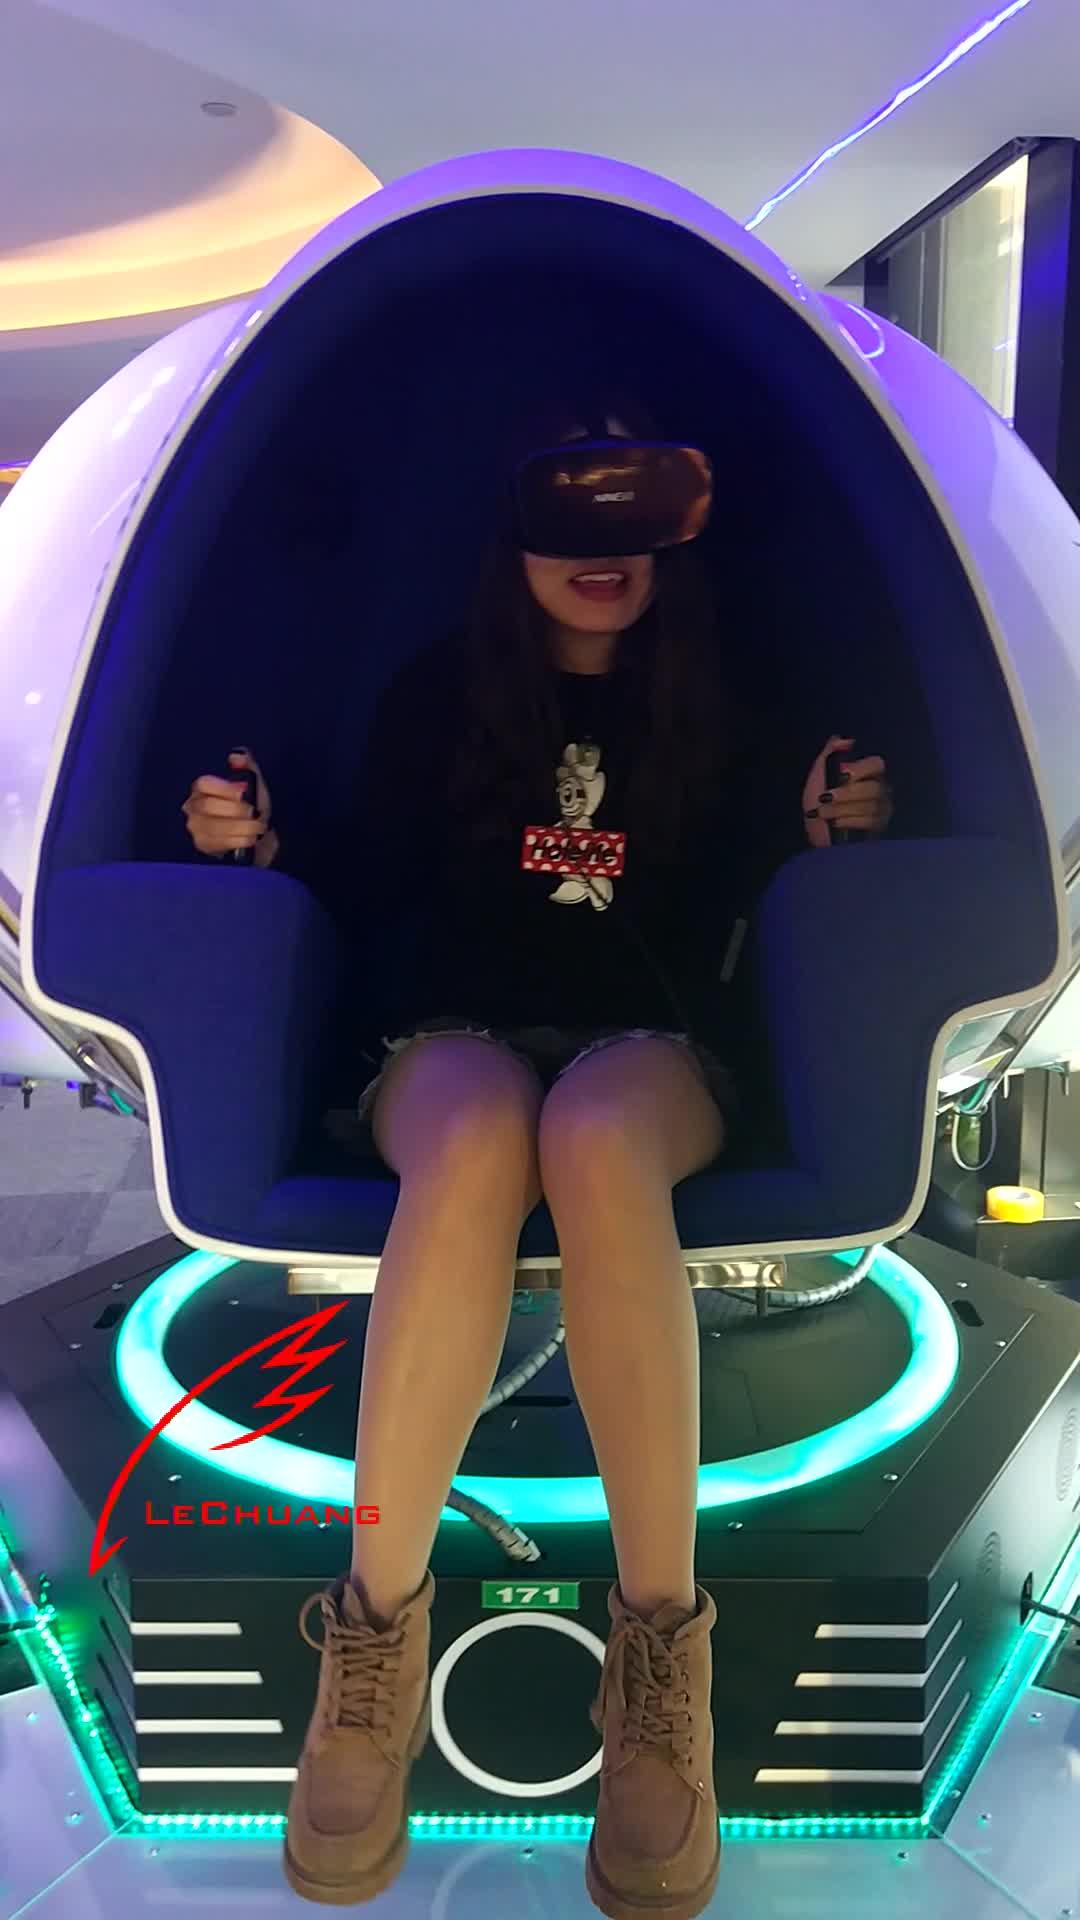 Ei Virtual Reality VR 5D 7D 9D 12D Cinema 9D Movie System vr Simulator Game Machine 9D ei VR Cinema simulator